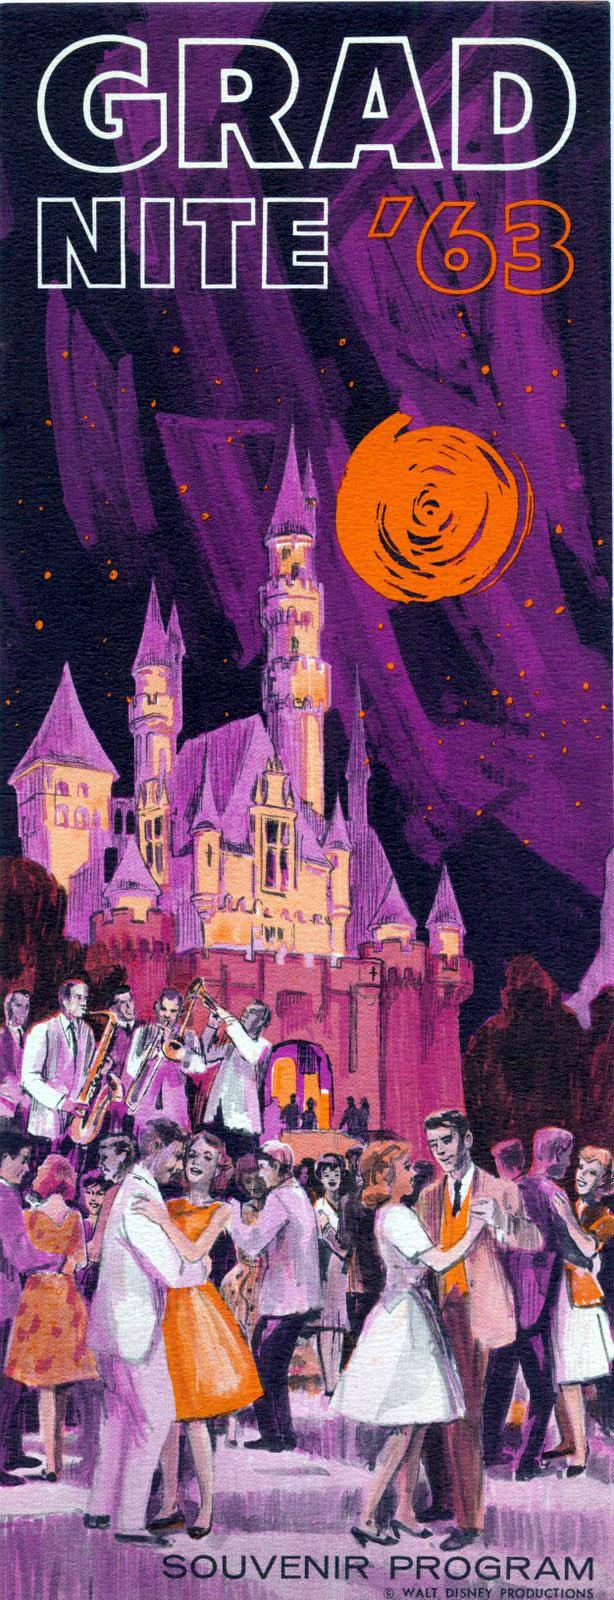 Disneyland grad night dates in Perth